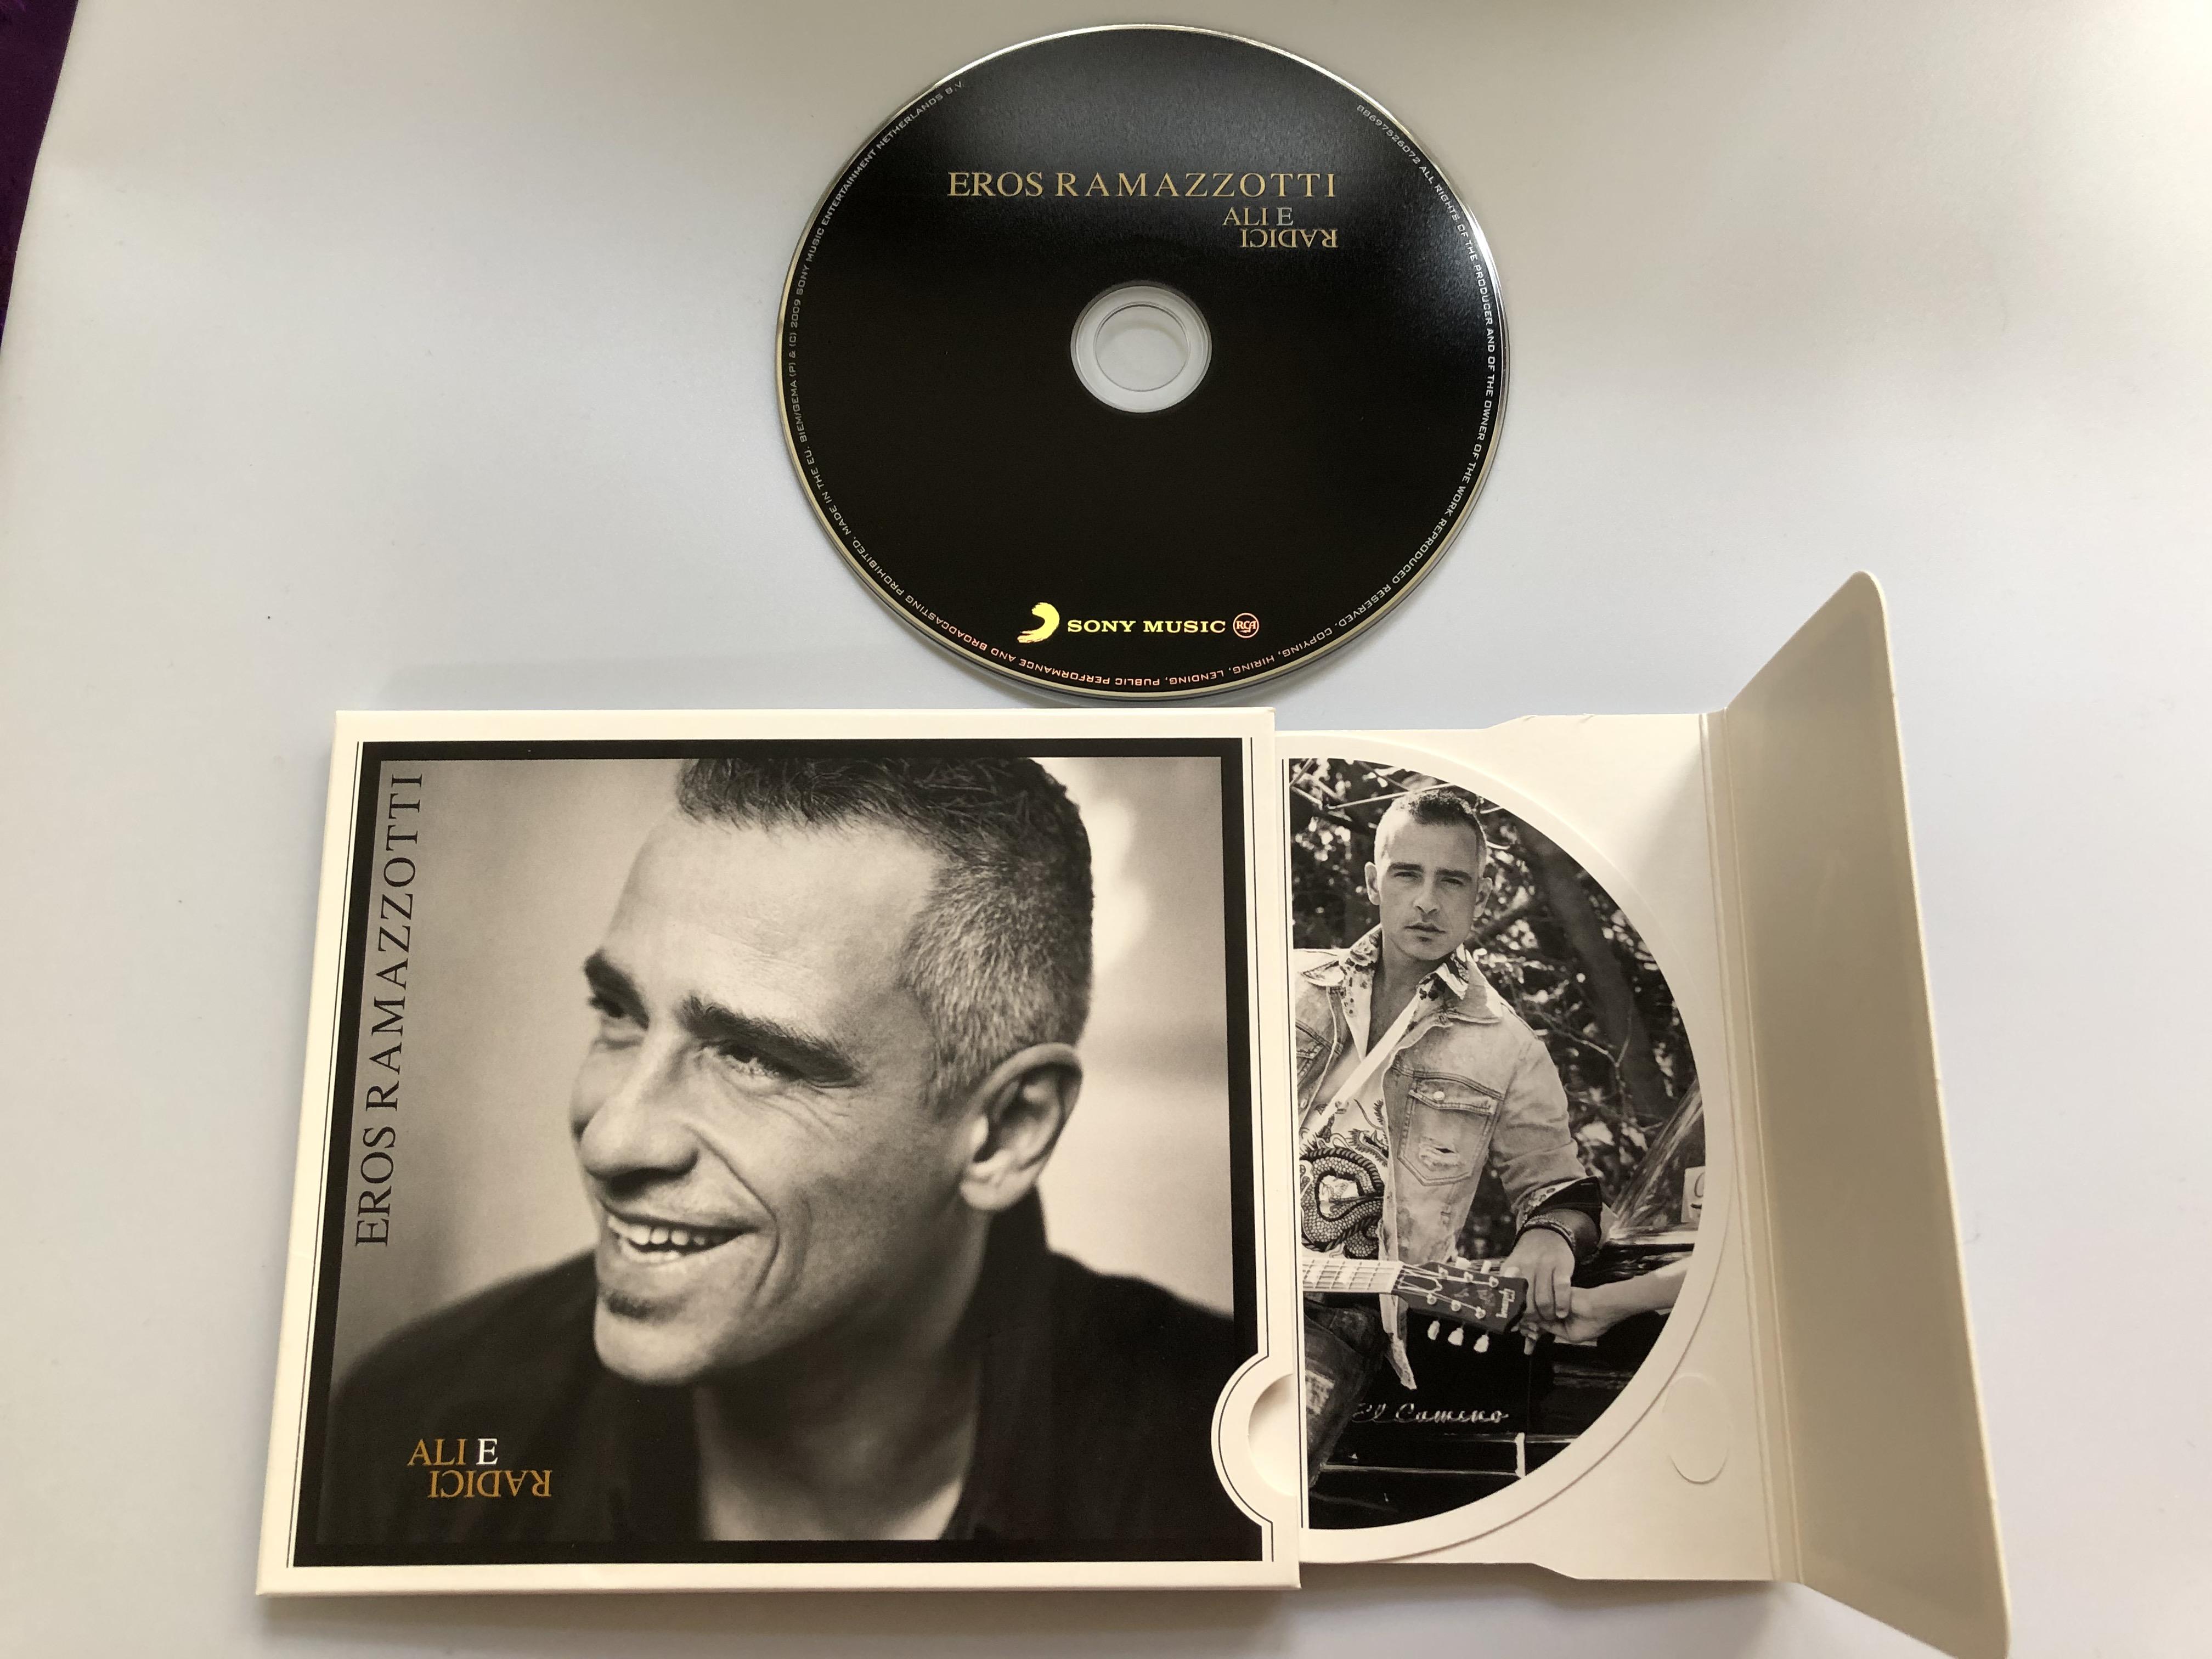 eros-ramazzotti-ali-e-radici-sony-music-audio-cd-2009-88697526072-5-.jpg